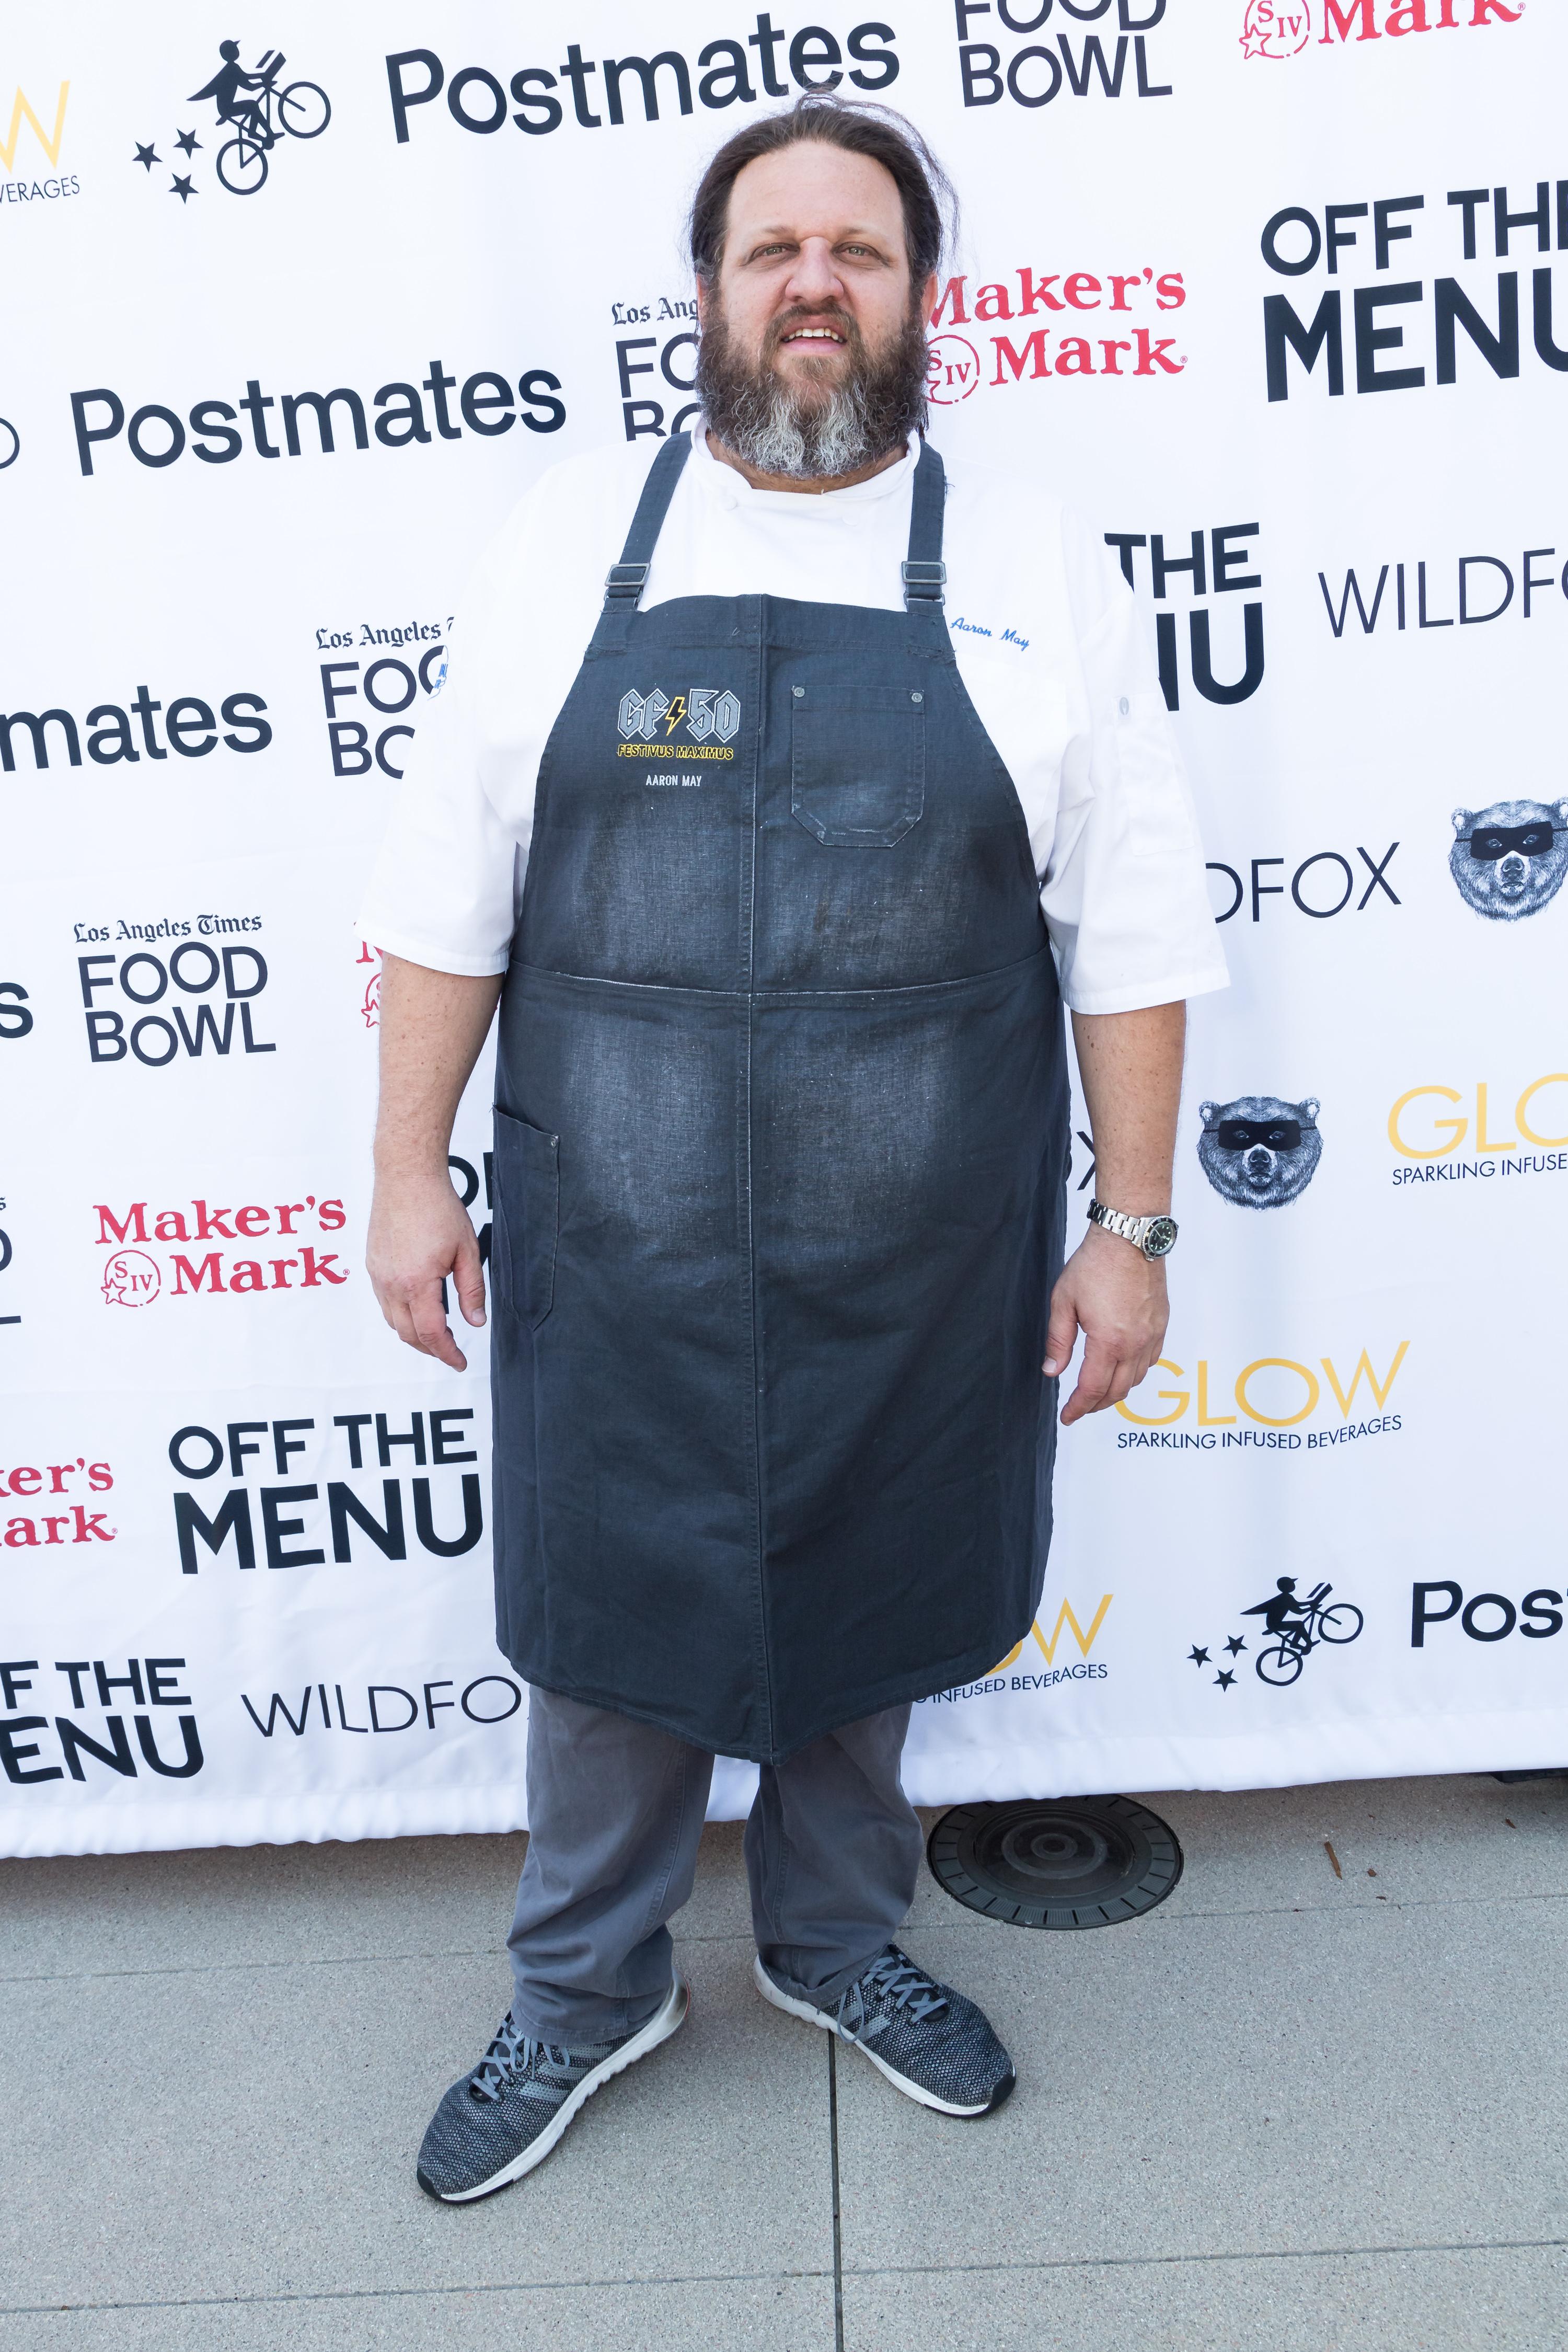 Aaron May chef charli d'amelio